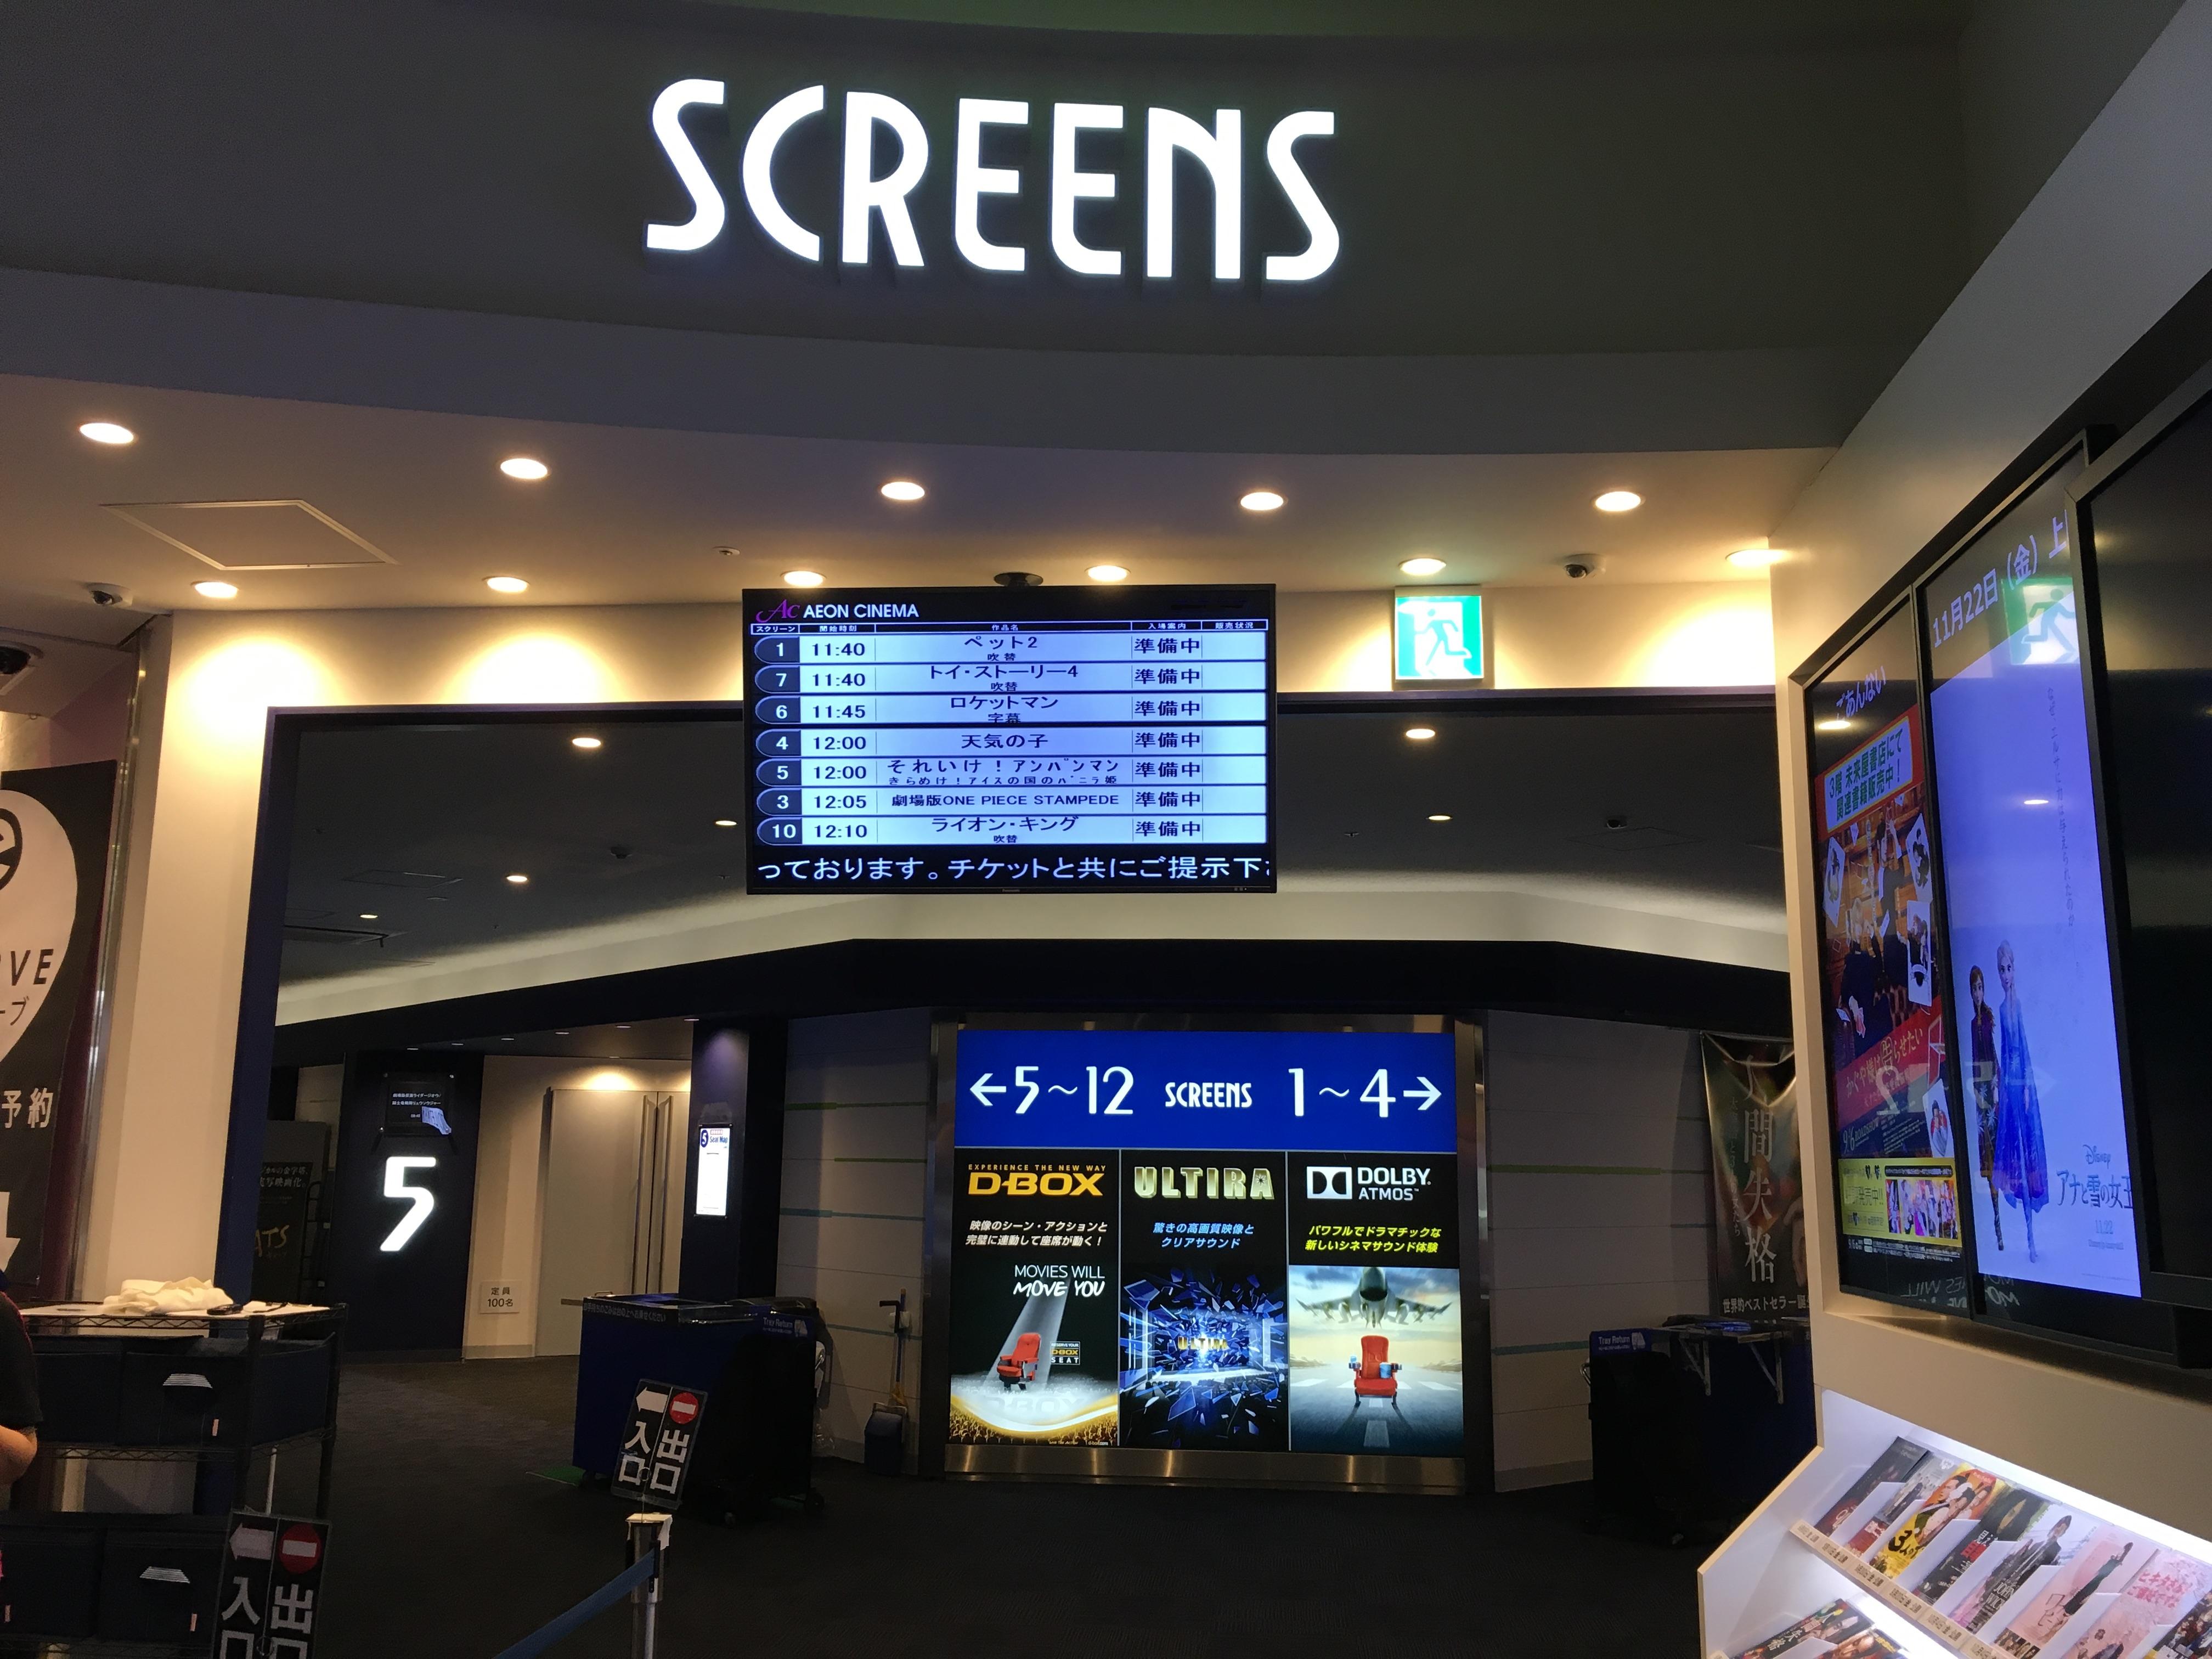 nagoyachaya-aeon-cinema